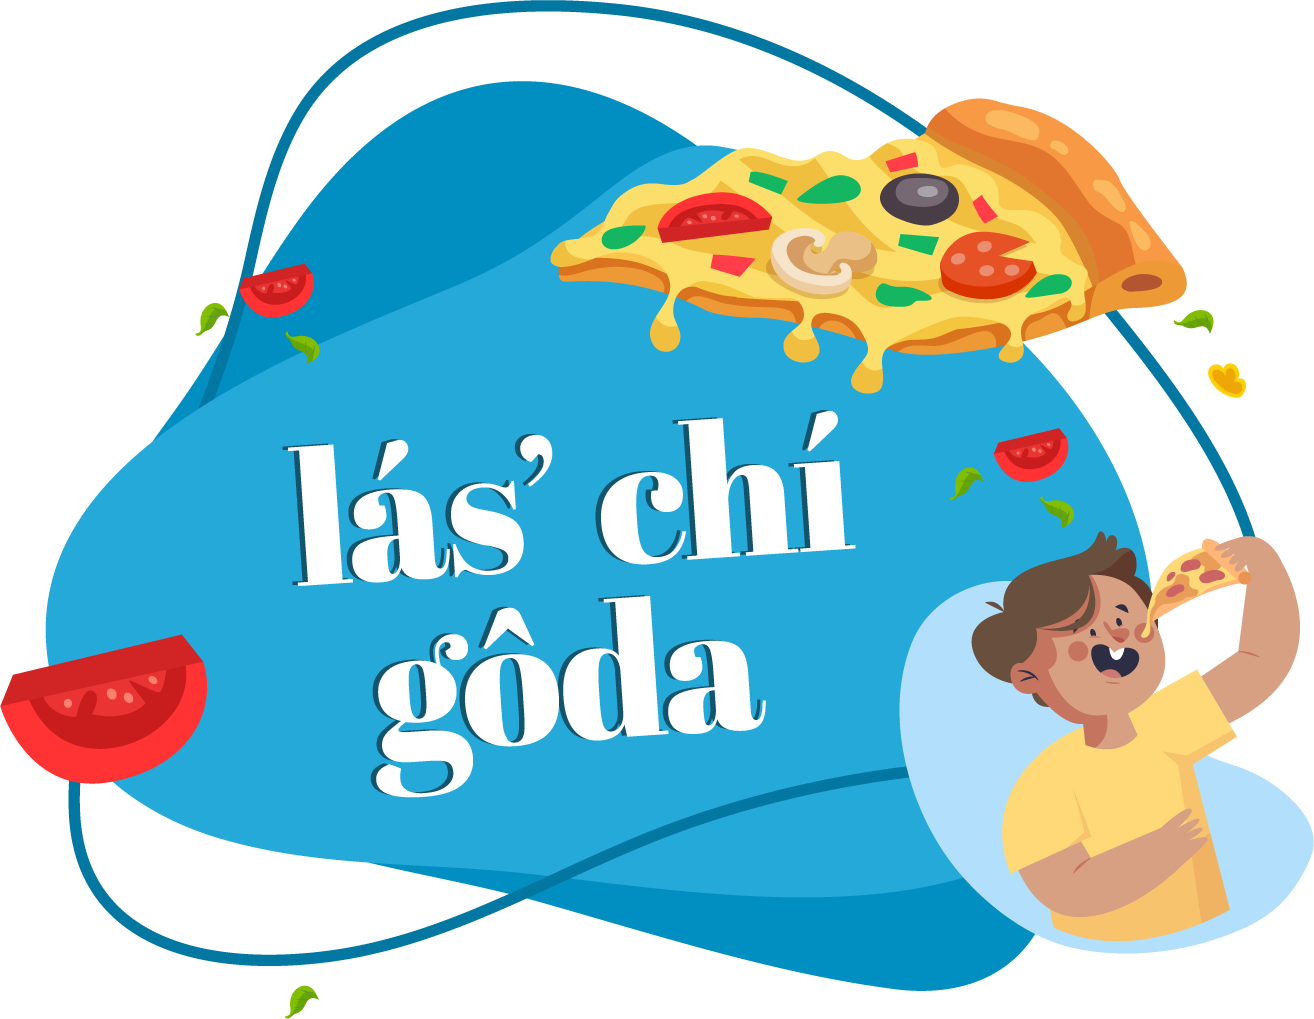 Las Chi Goda Valentini Village